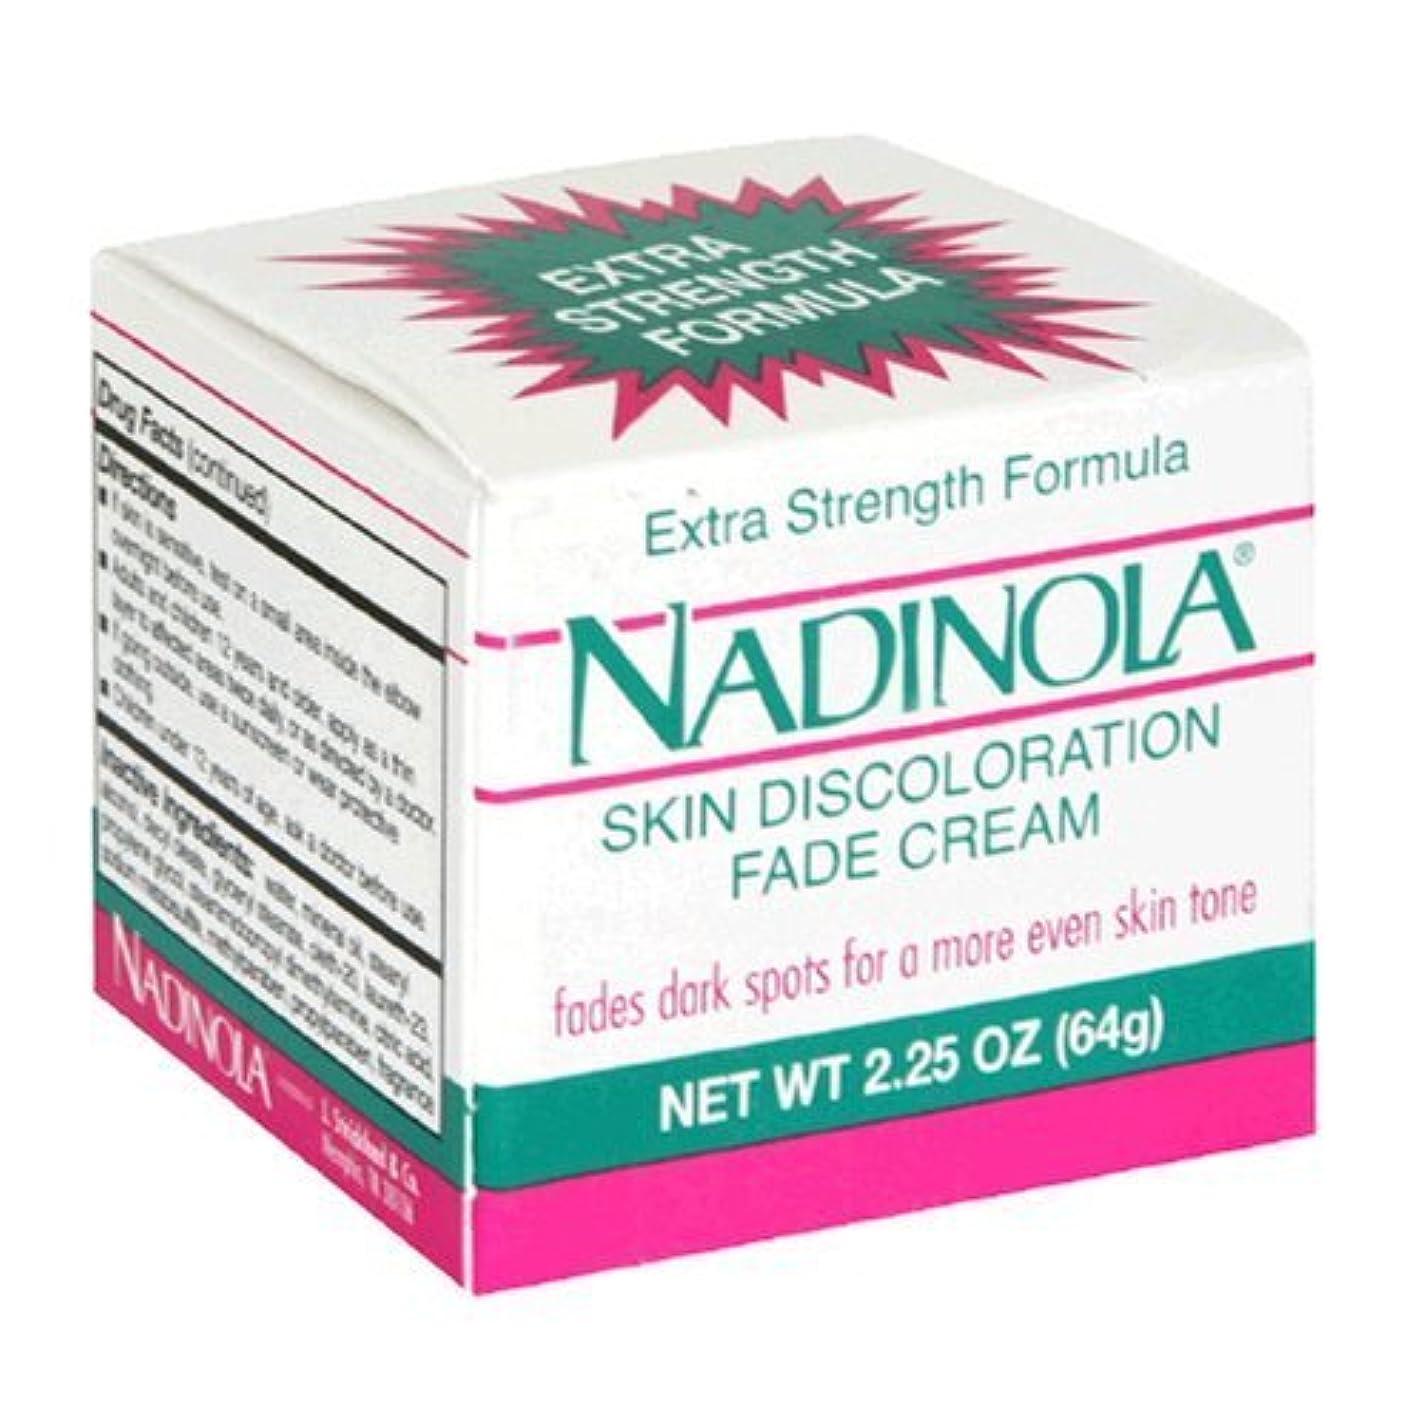 講義冒険者大声でNadinola Discoloration Fade Cream 2.25oz Extra Strength (並行輸入品)